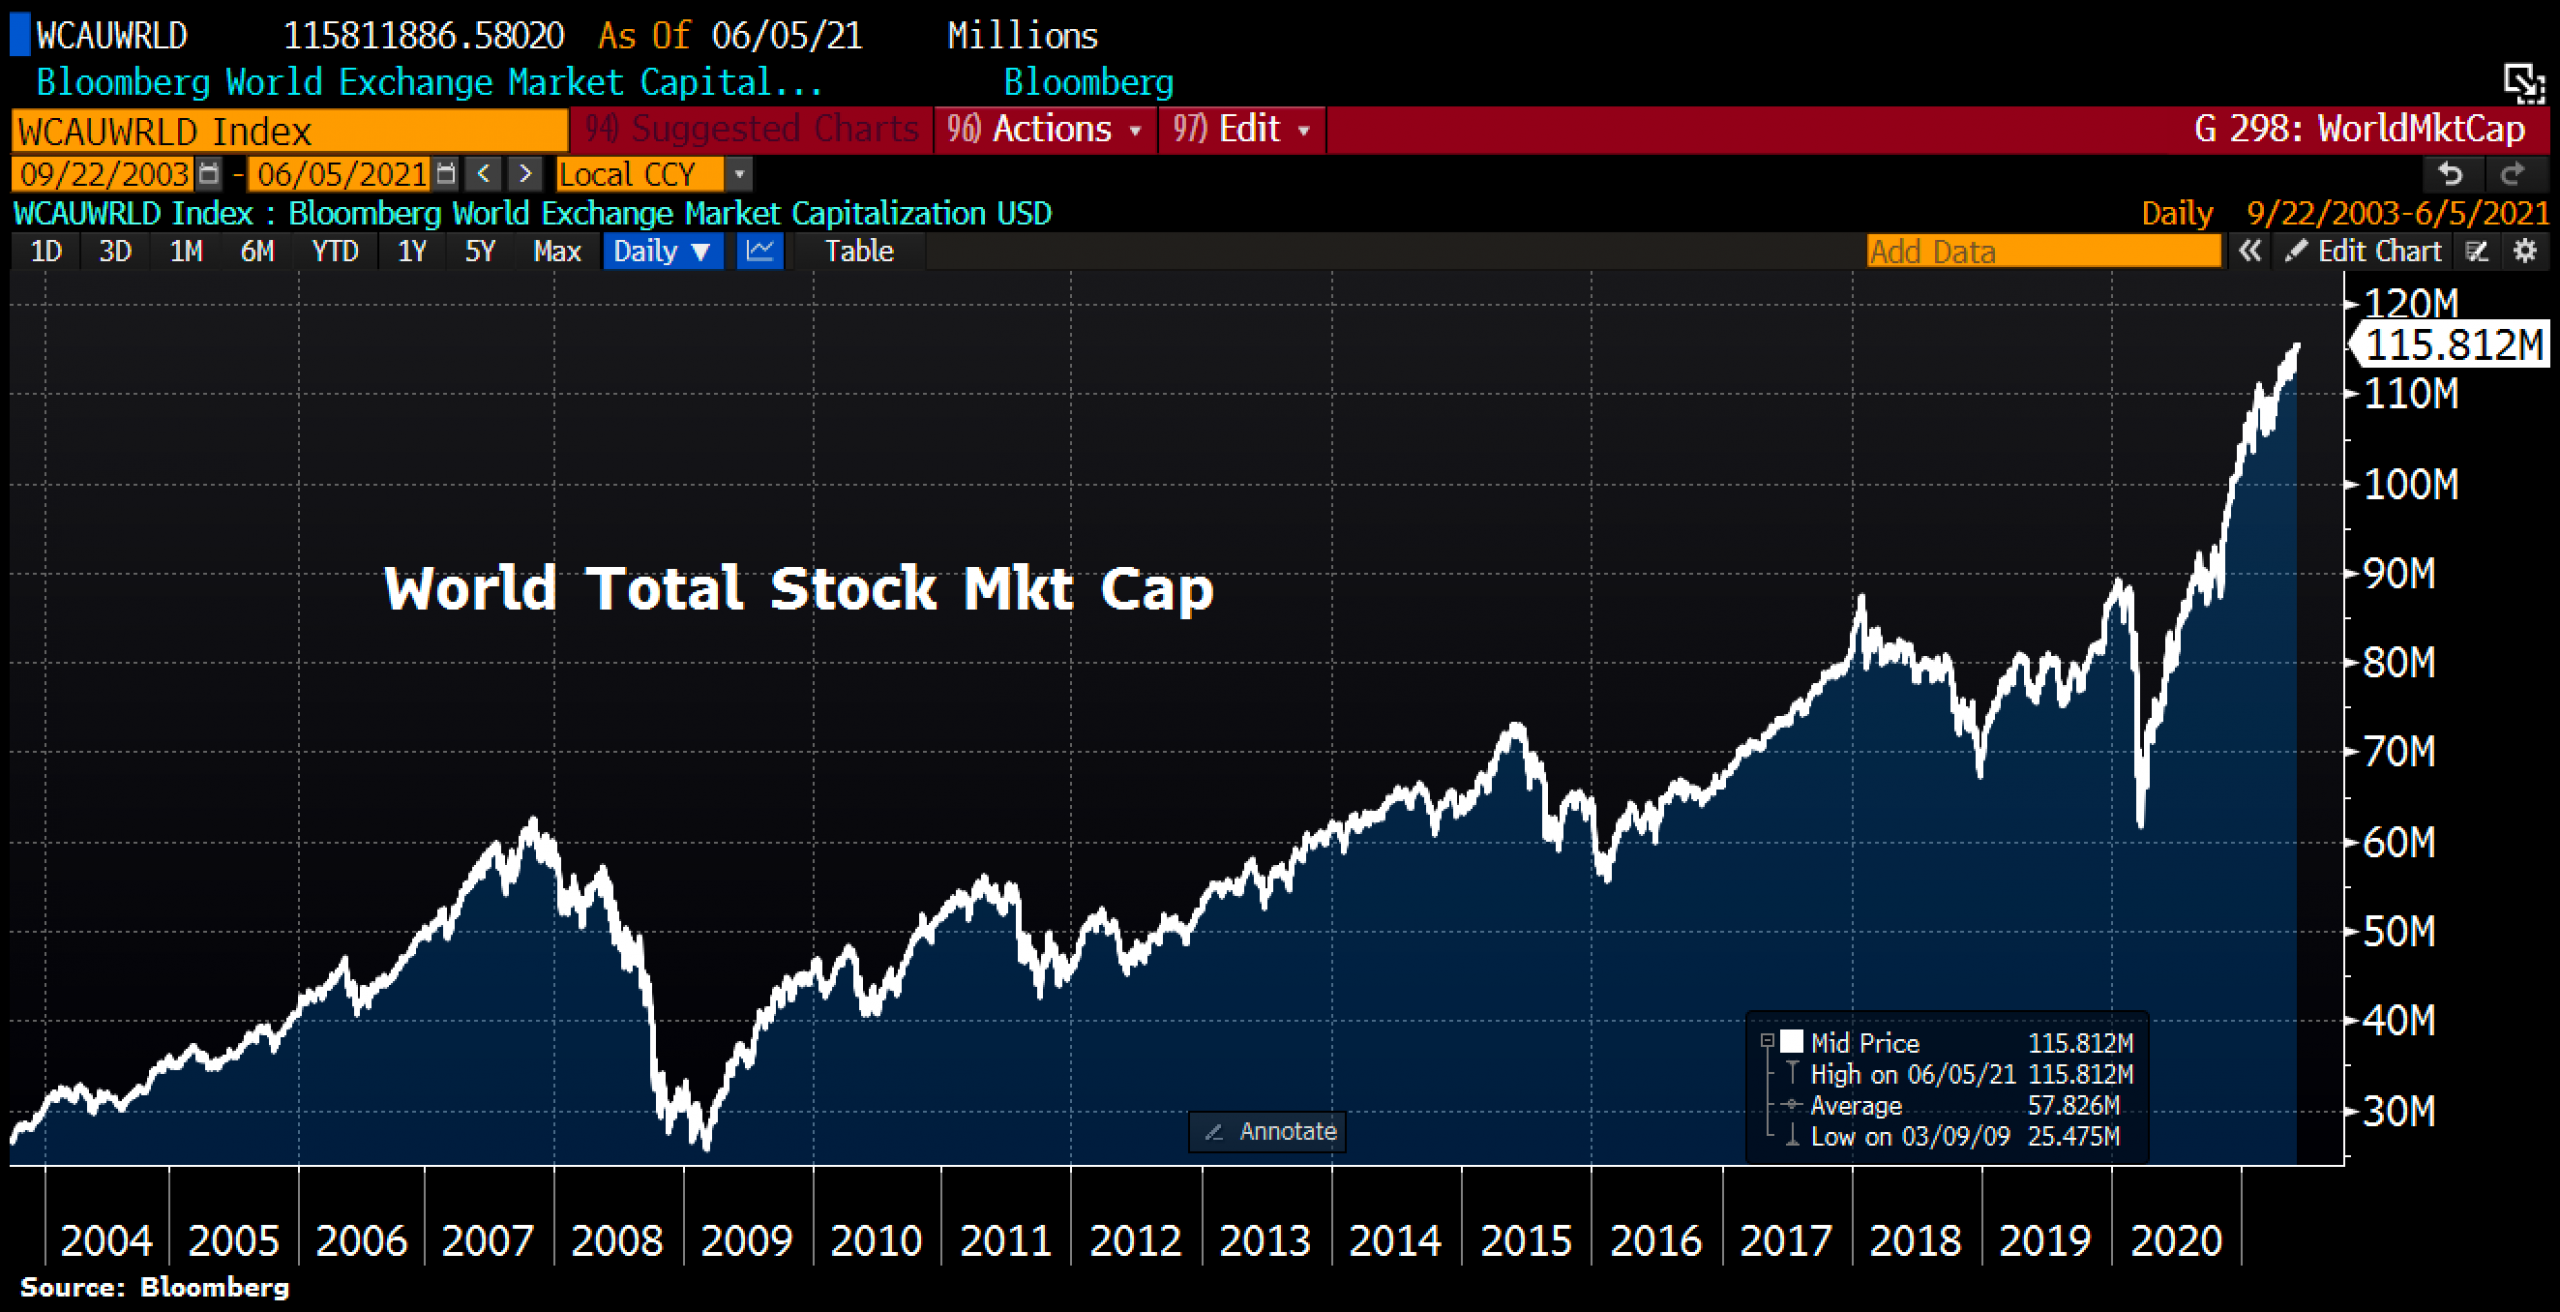 World stock market cap. © Holger Zschaepitz via Twitter @Schuldensuehner, June 6th, 2021.